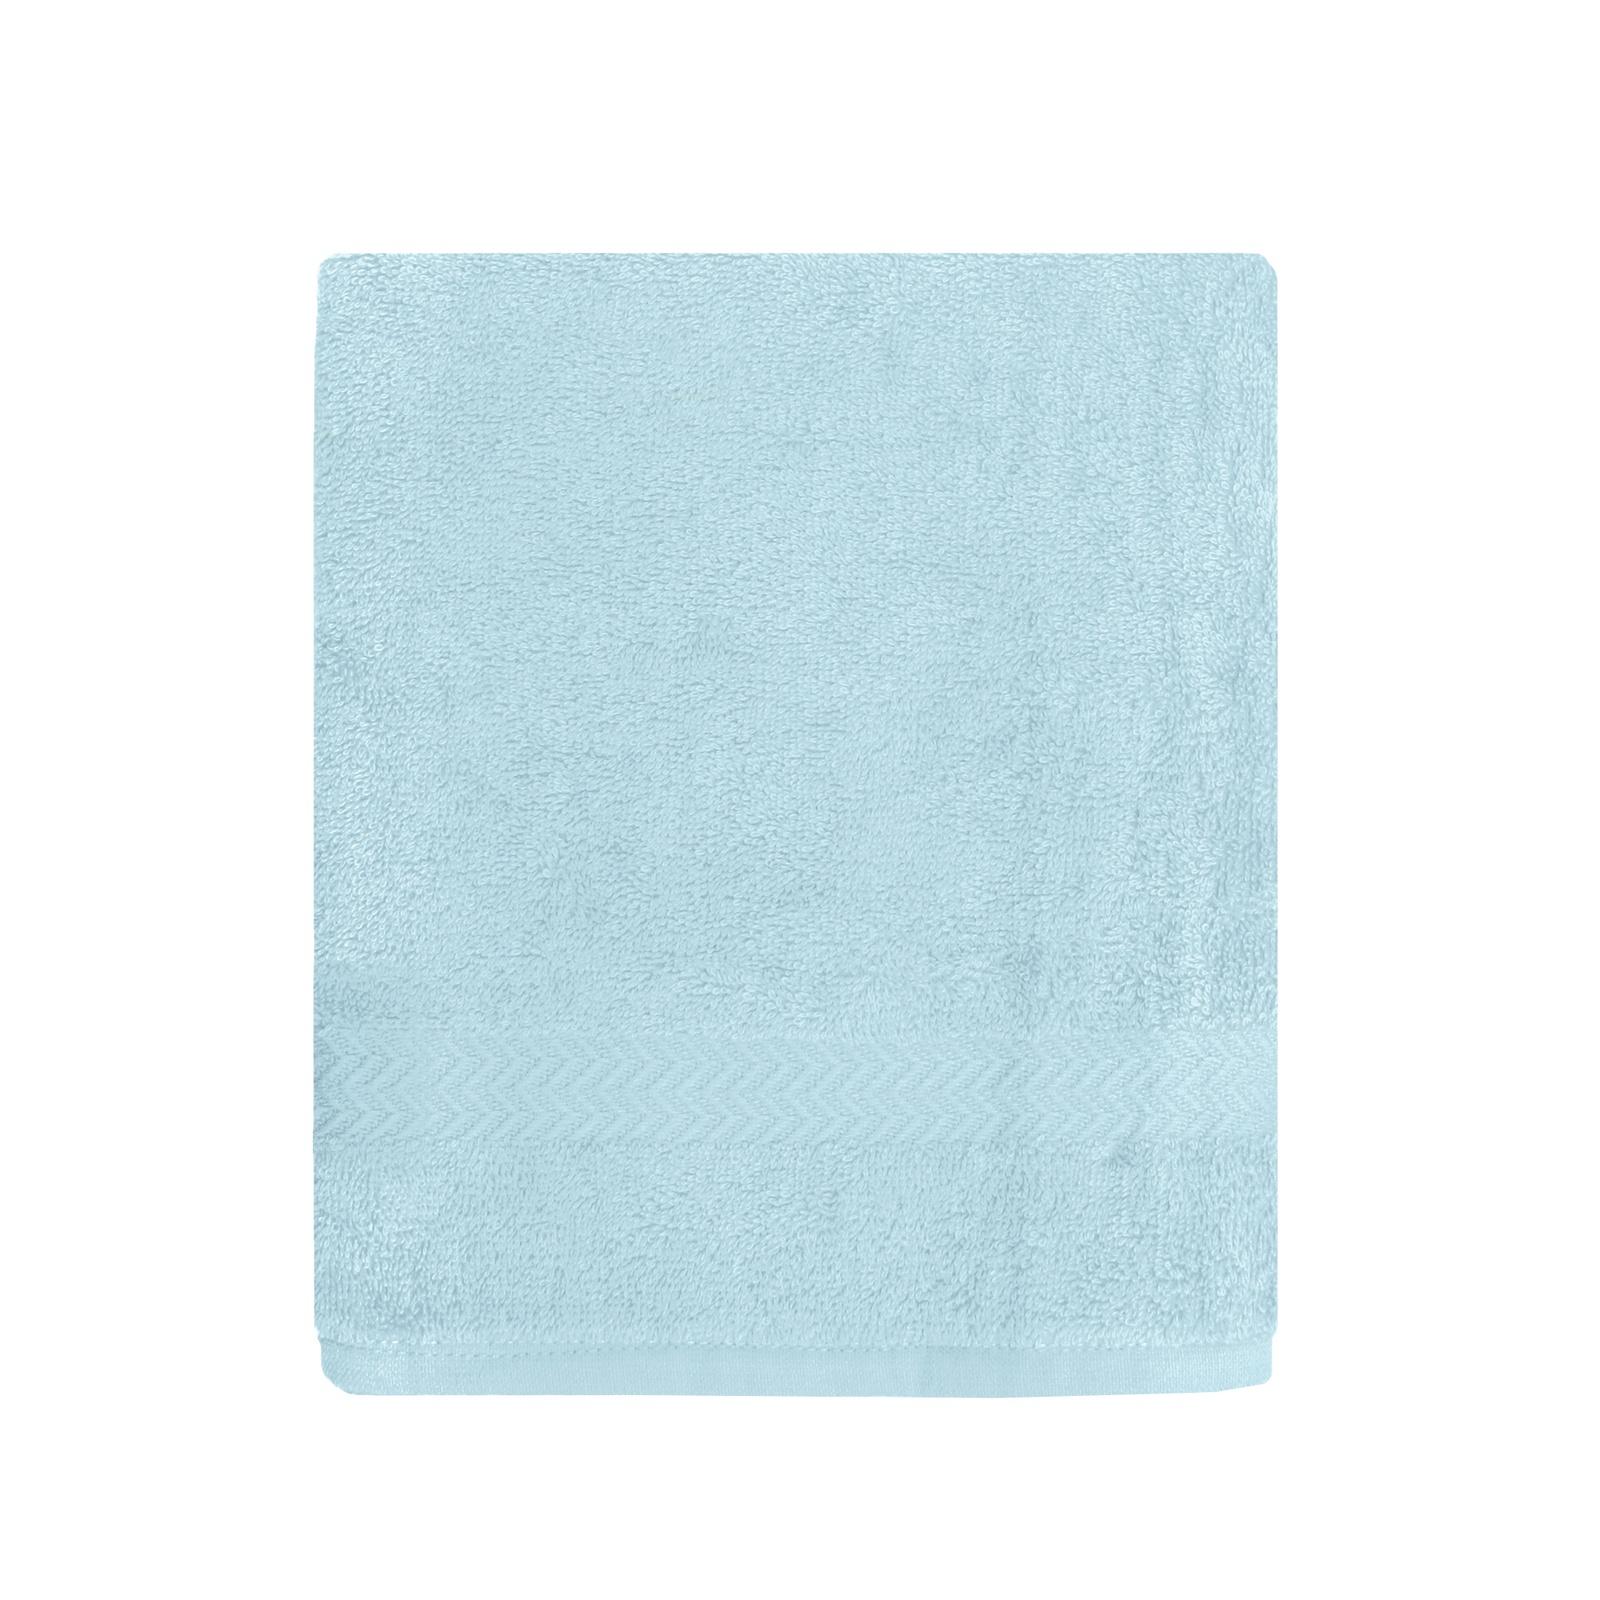 Полотенце банное Bonita Classic, 21011215141, голубой, 70 х 140 см полотенца william roberts полотенце банное aberdeen цвет queen shadow серо голубой 70х140 см